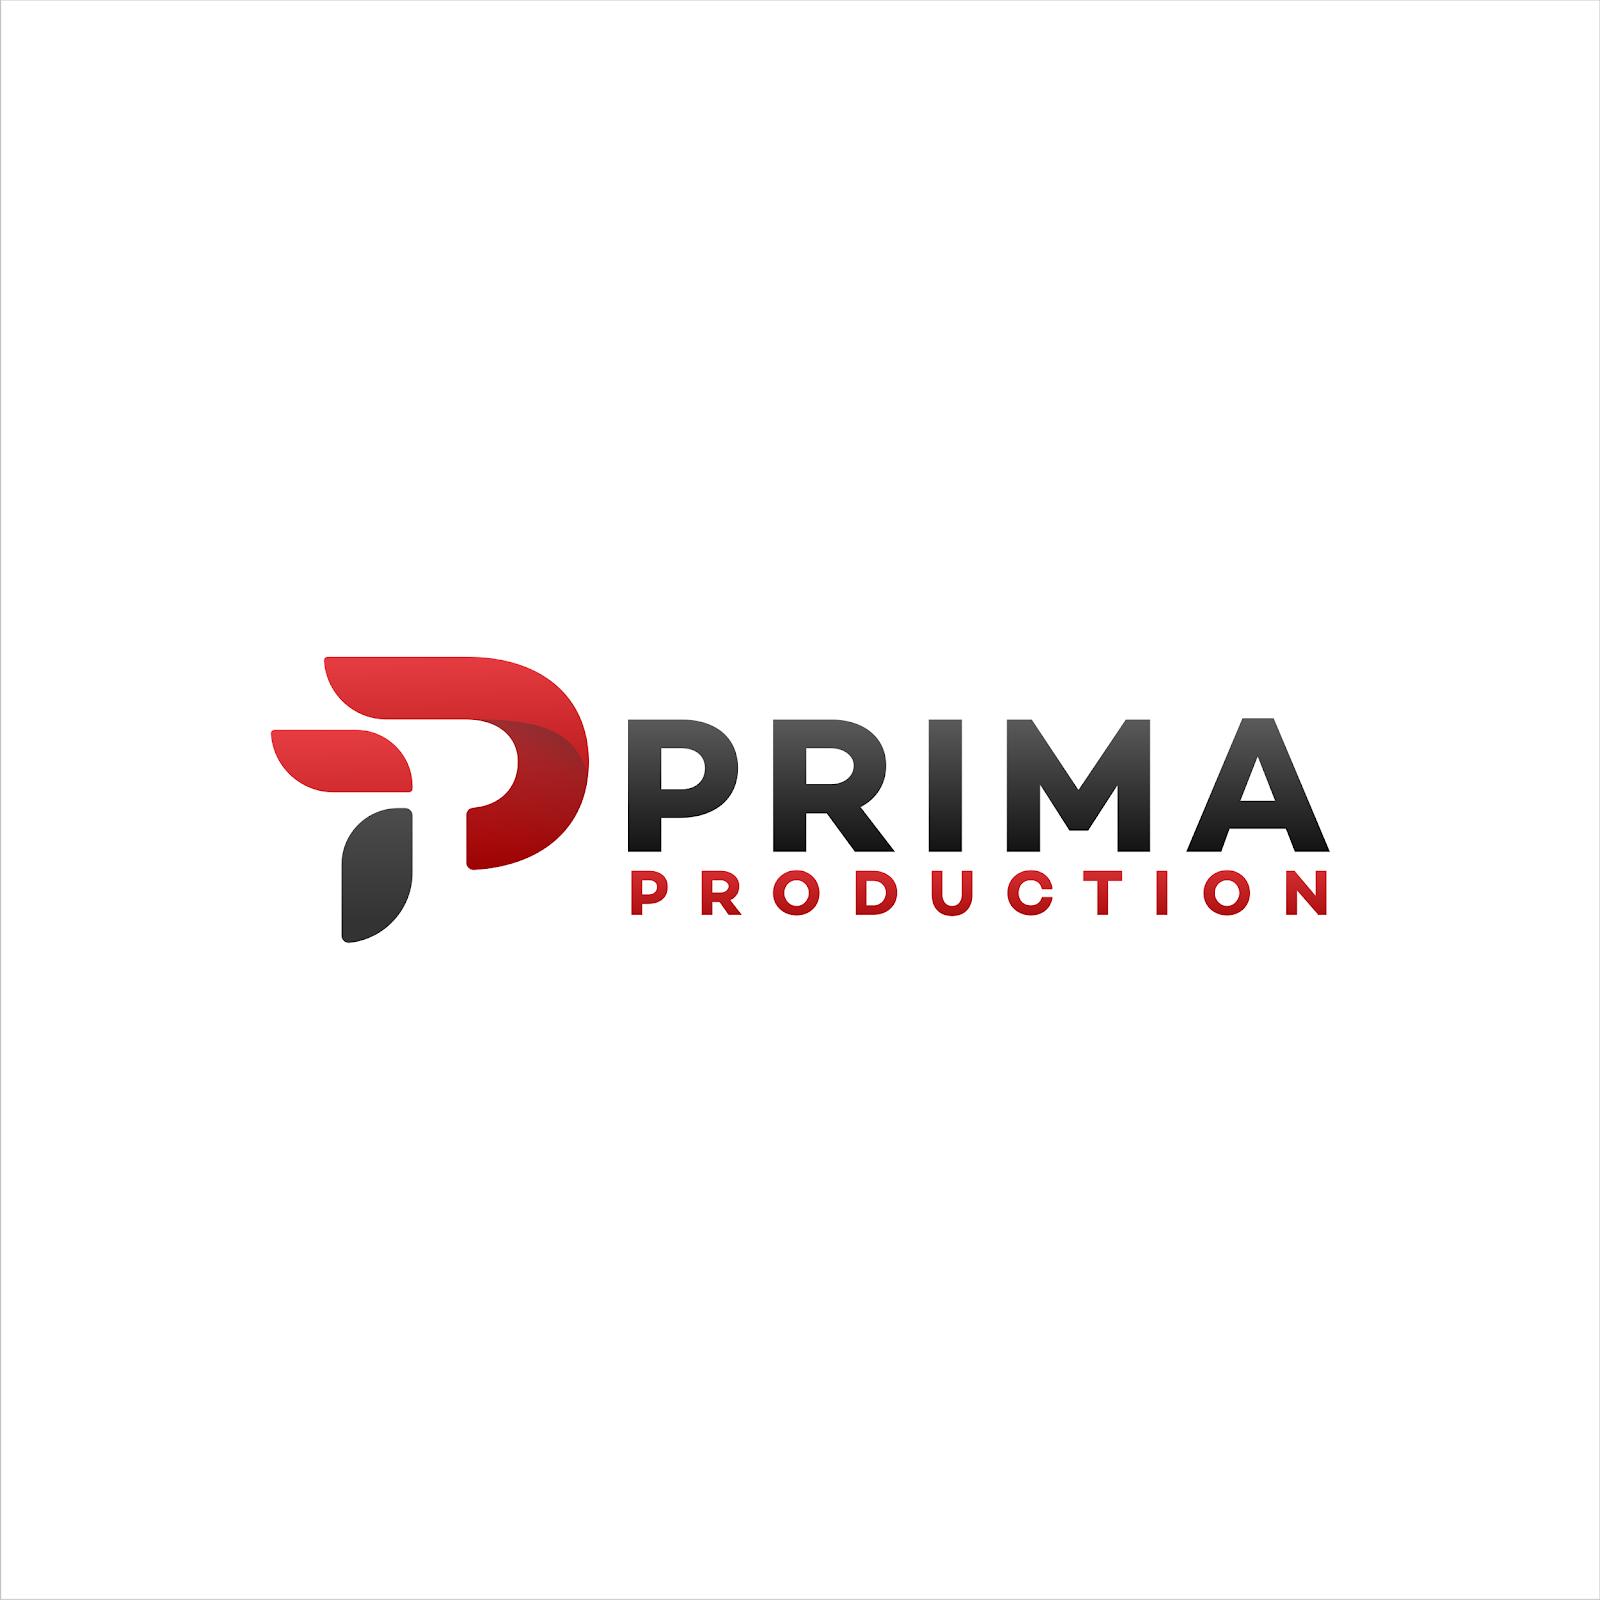 PrimaProduction